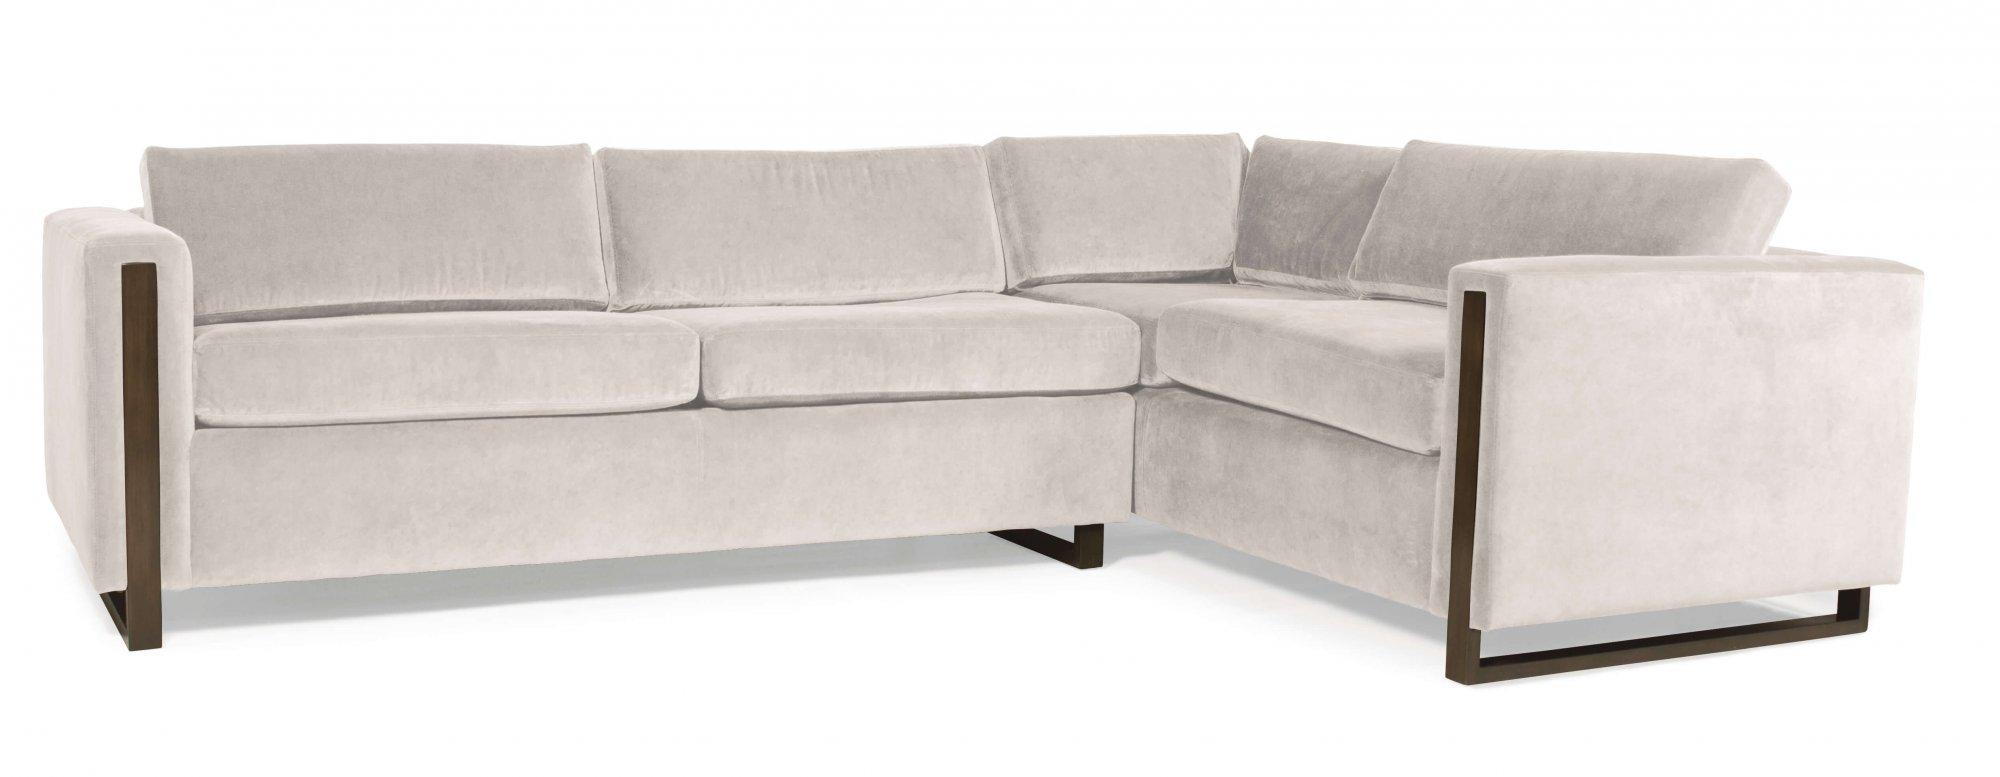 Grid  Sectional Sleeper Sofa